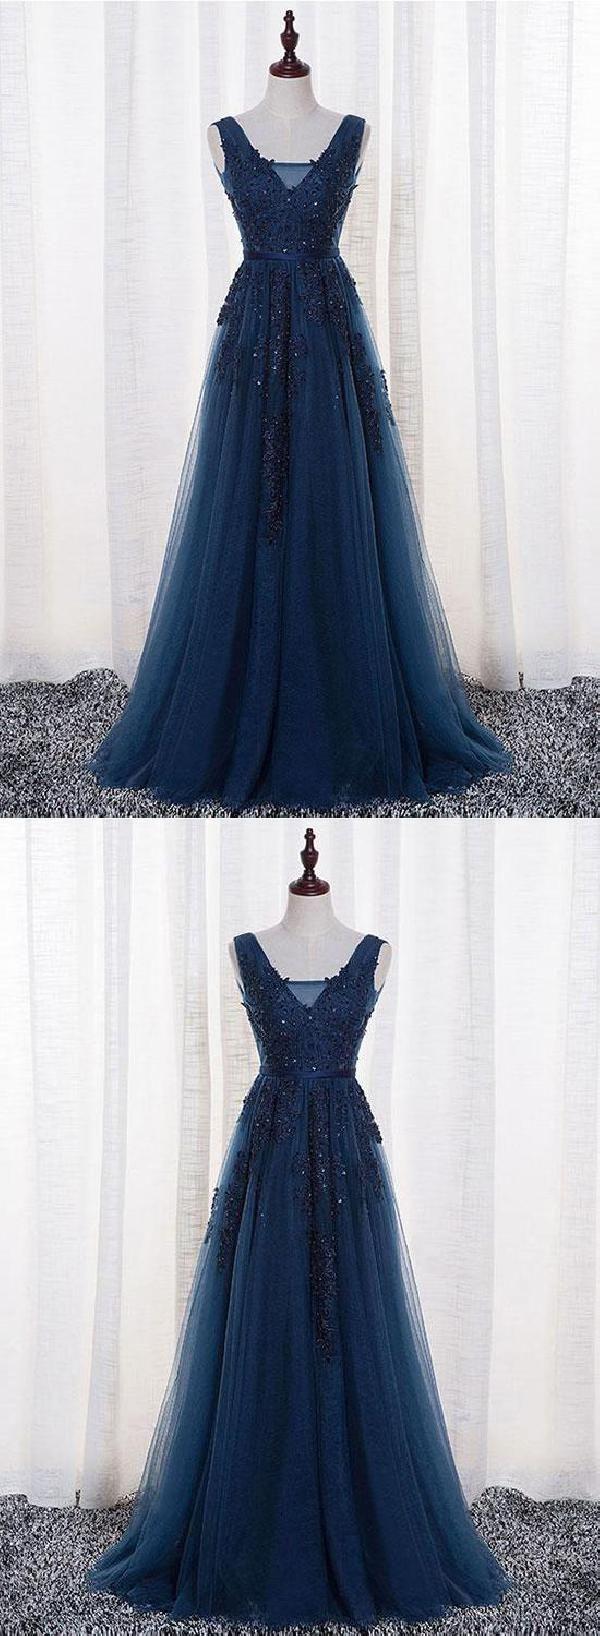 Discount absorbing vneck bridesmaid dress dark blue prom dress